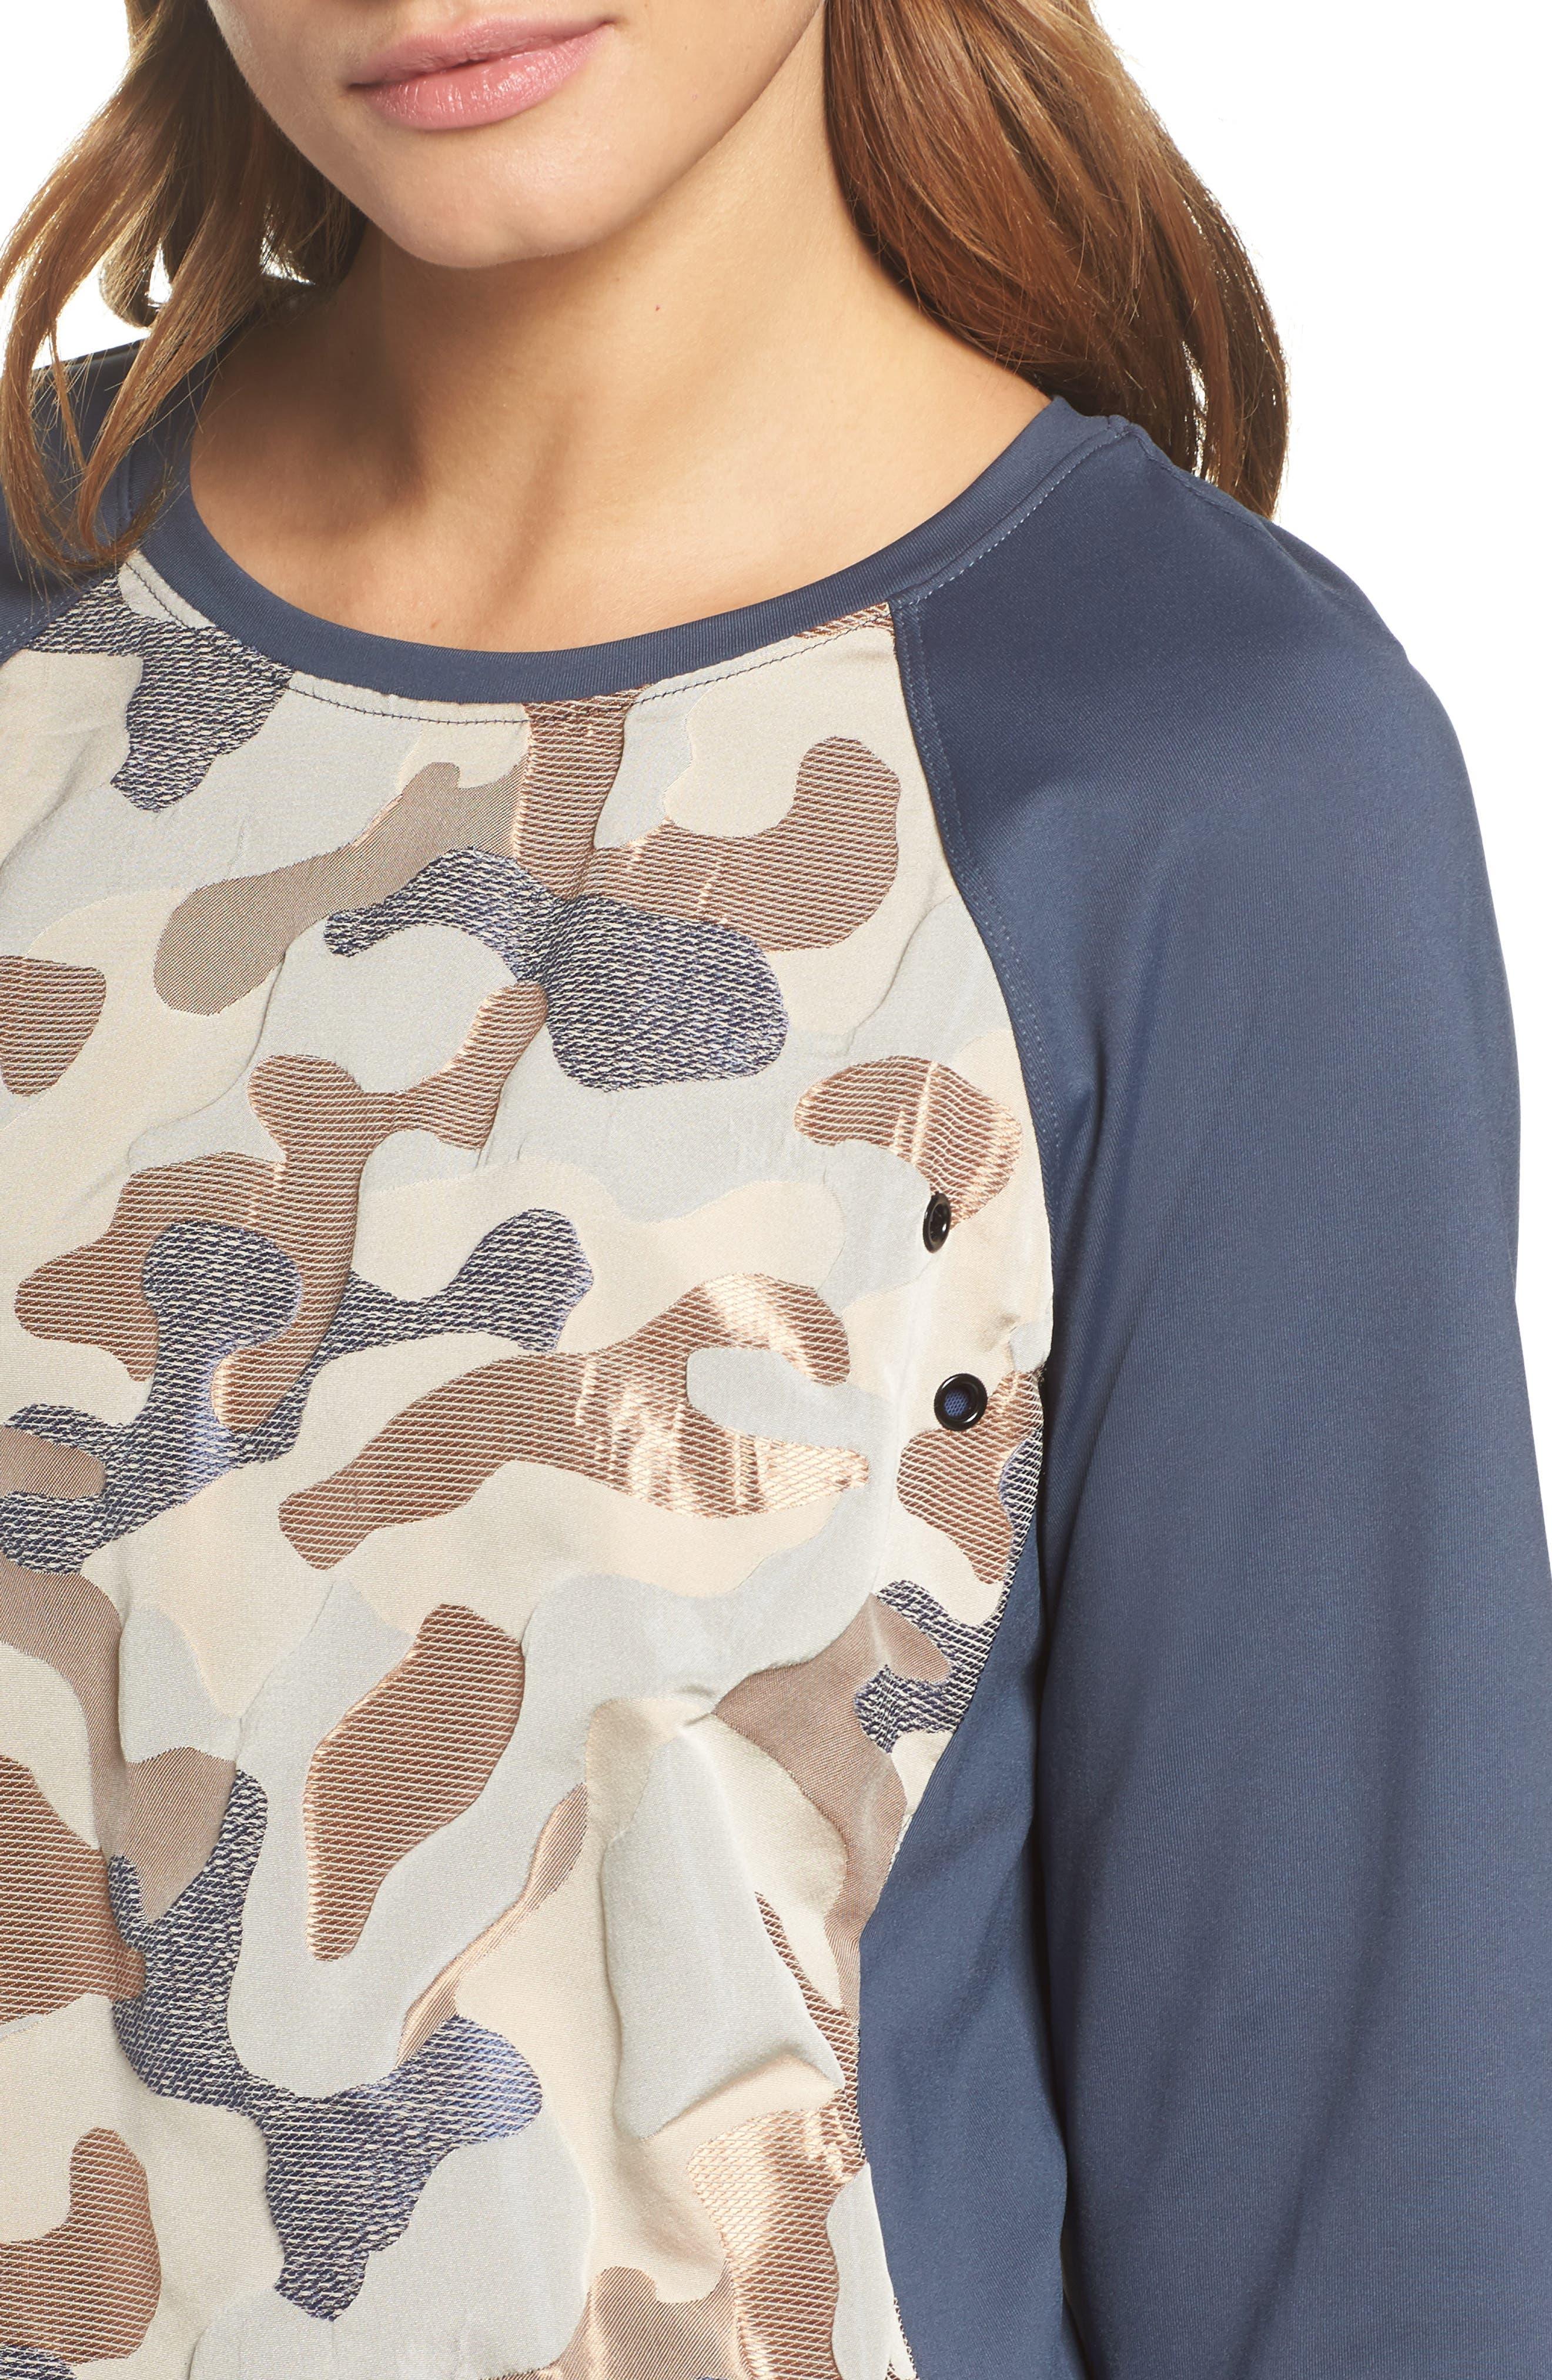 Olvera Sweatshirt,                             Alternate thumbnail 4, color,                             250